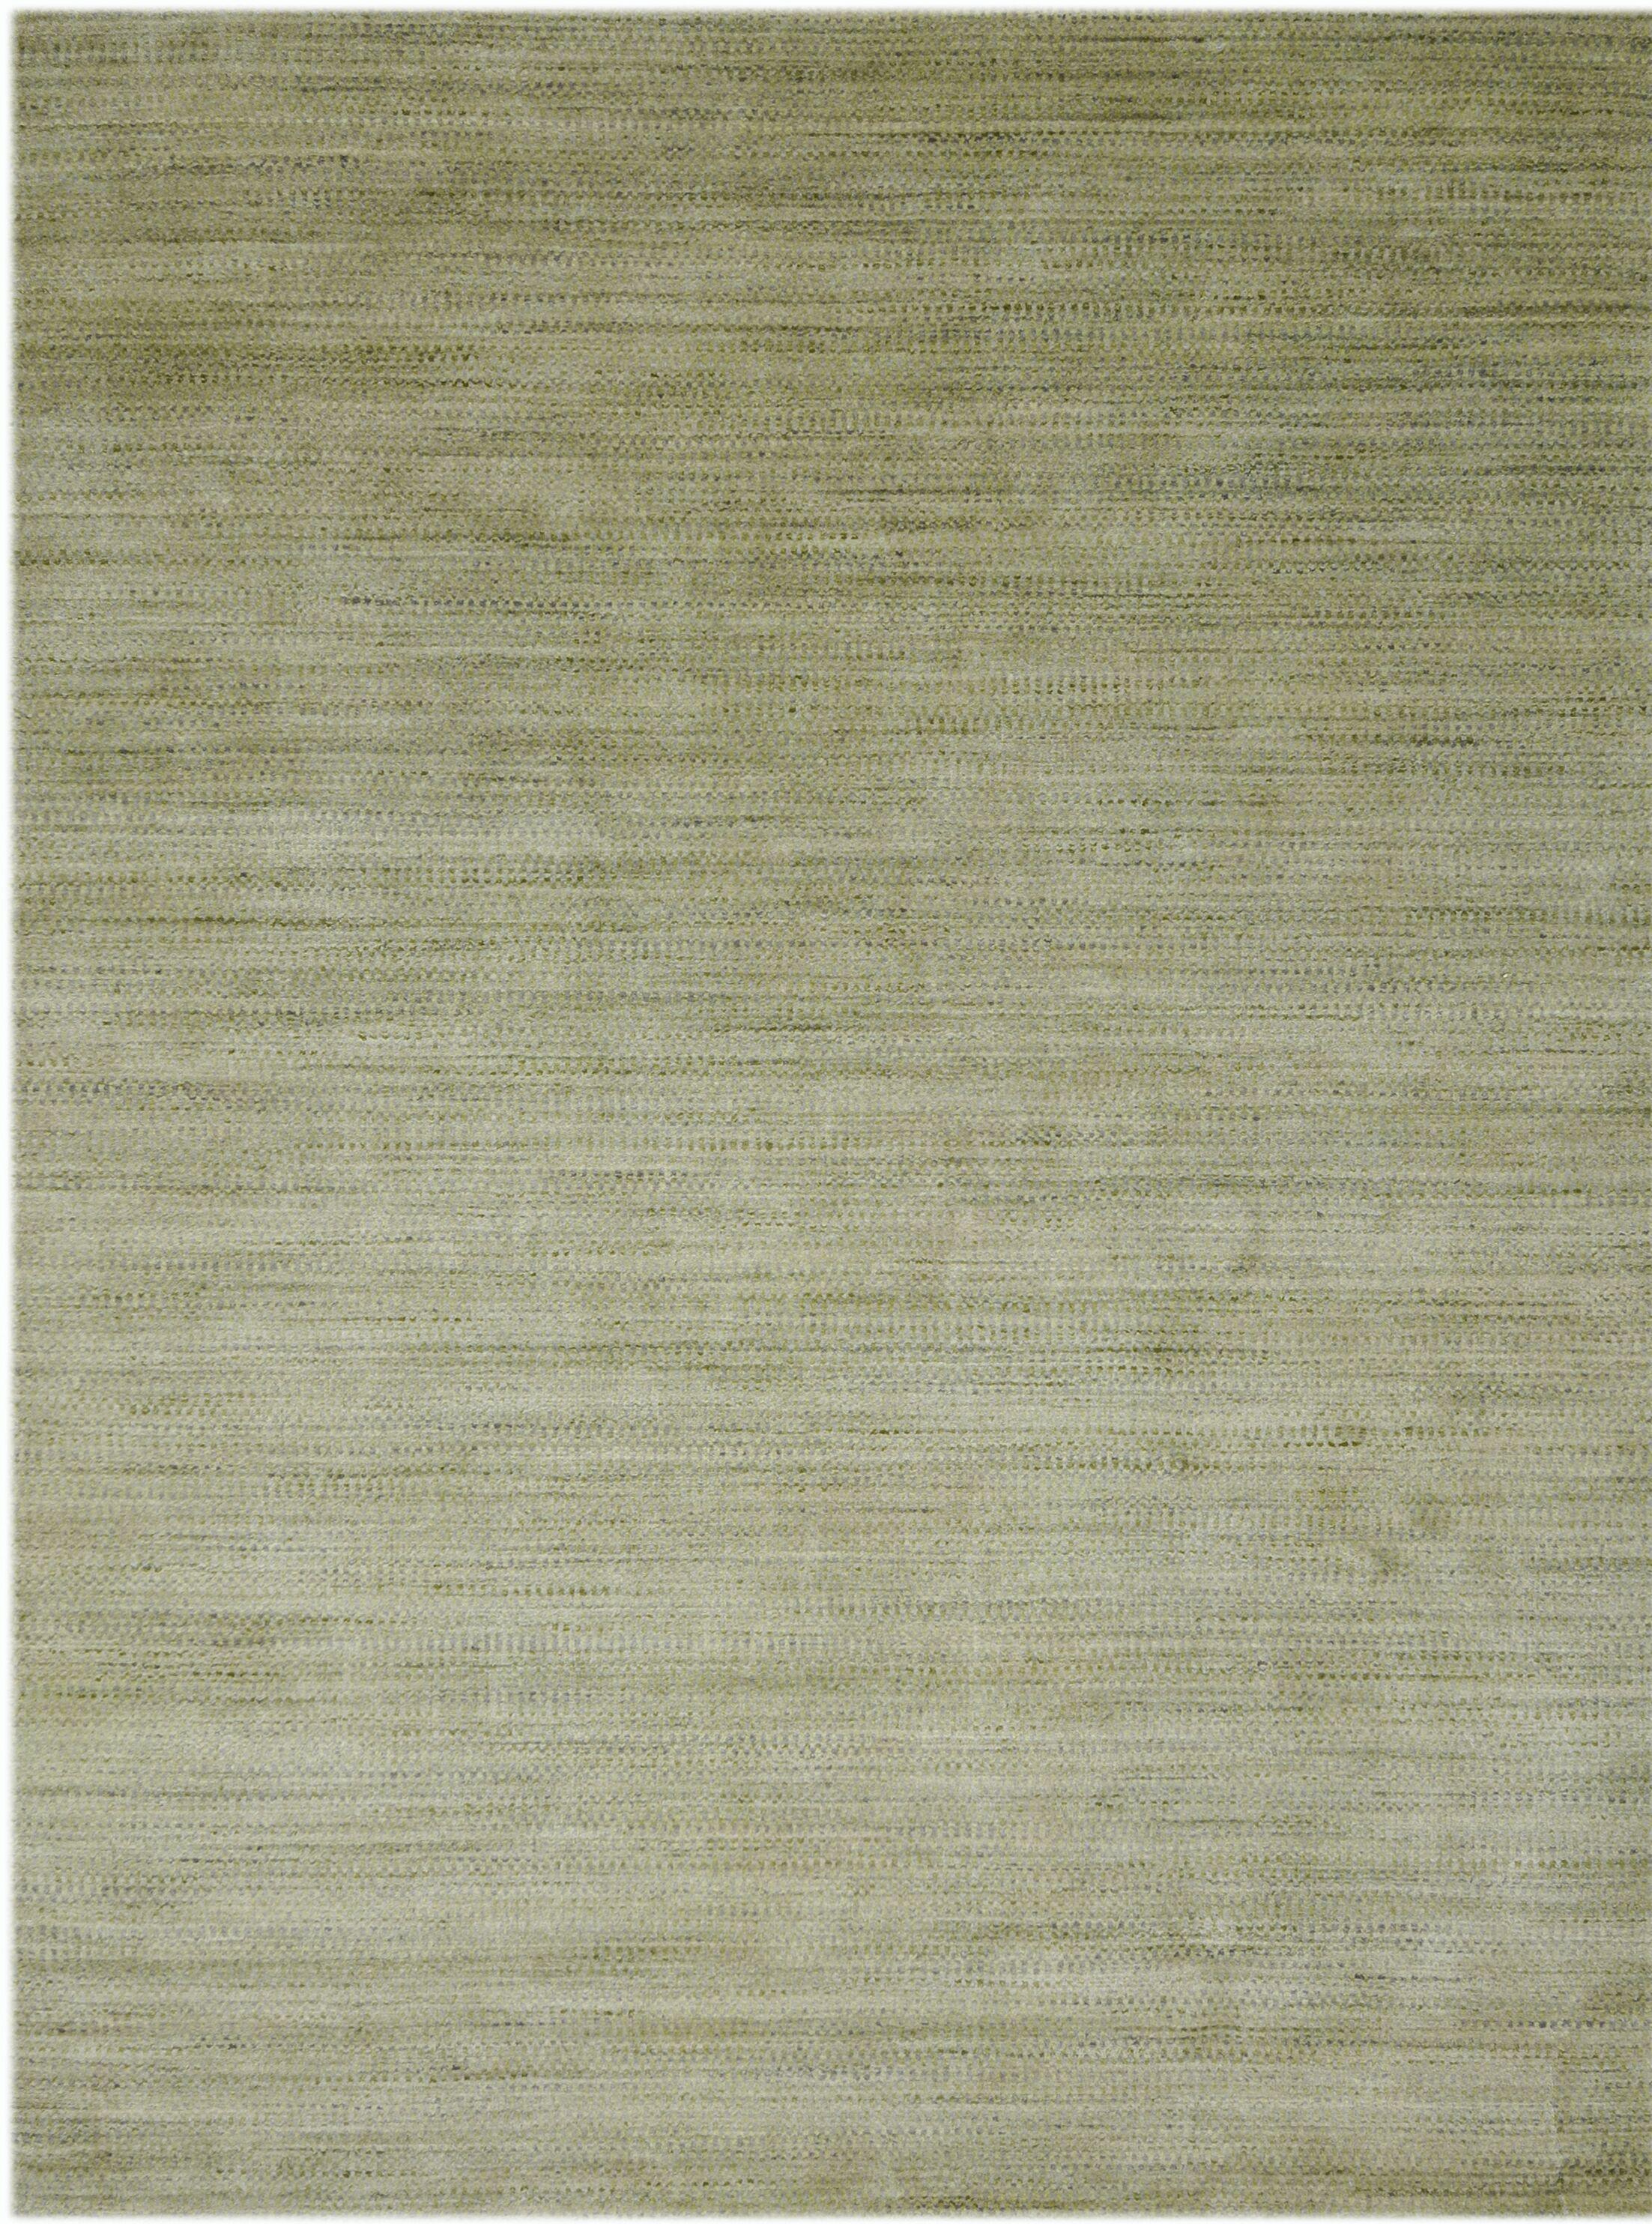 Adamsburg Hand-Woven Green Area Rug Rug Size: Rectangle 3' x 5'